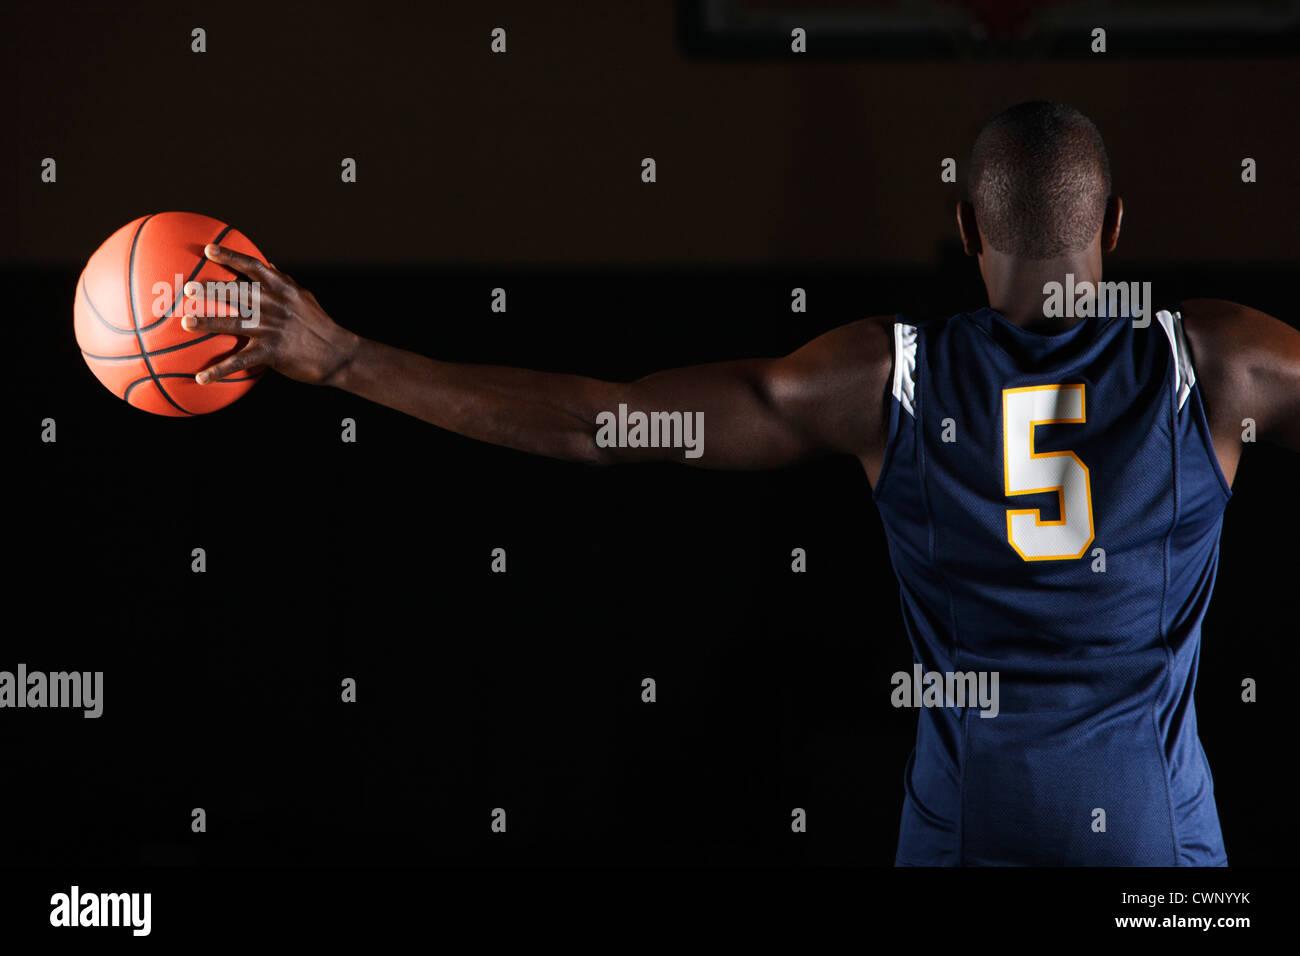 Basket-ball Basket-ball joueur tenant en main, vue arrière Photo Stock